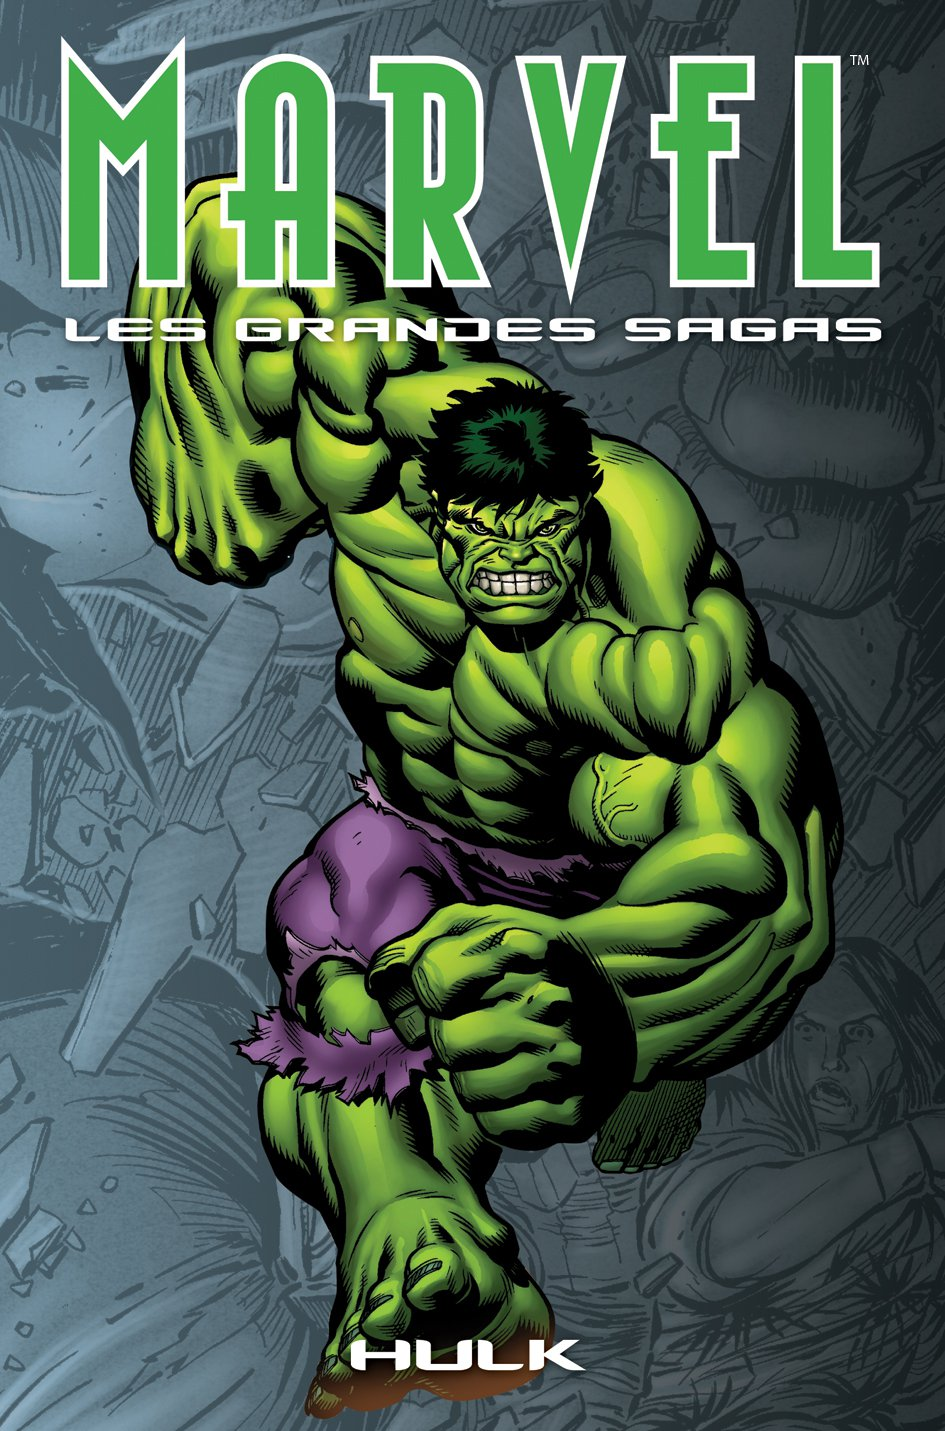 Marvel : Les grandes sagas T6 : Hulk - Marvels (6/10) (0), comics chez Panini Comics de Jones, Busiek, Ross, Romita Jr, Studio F, McGuinness